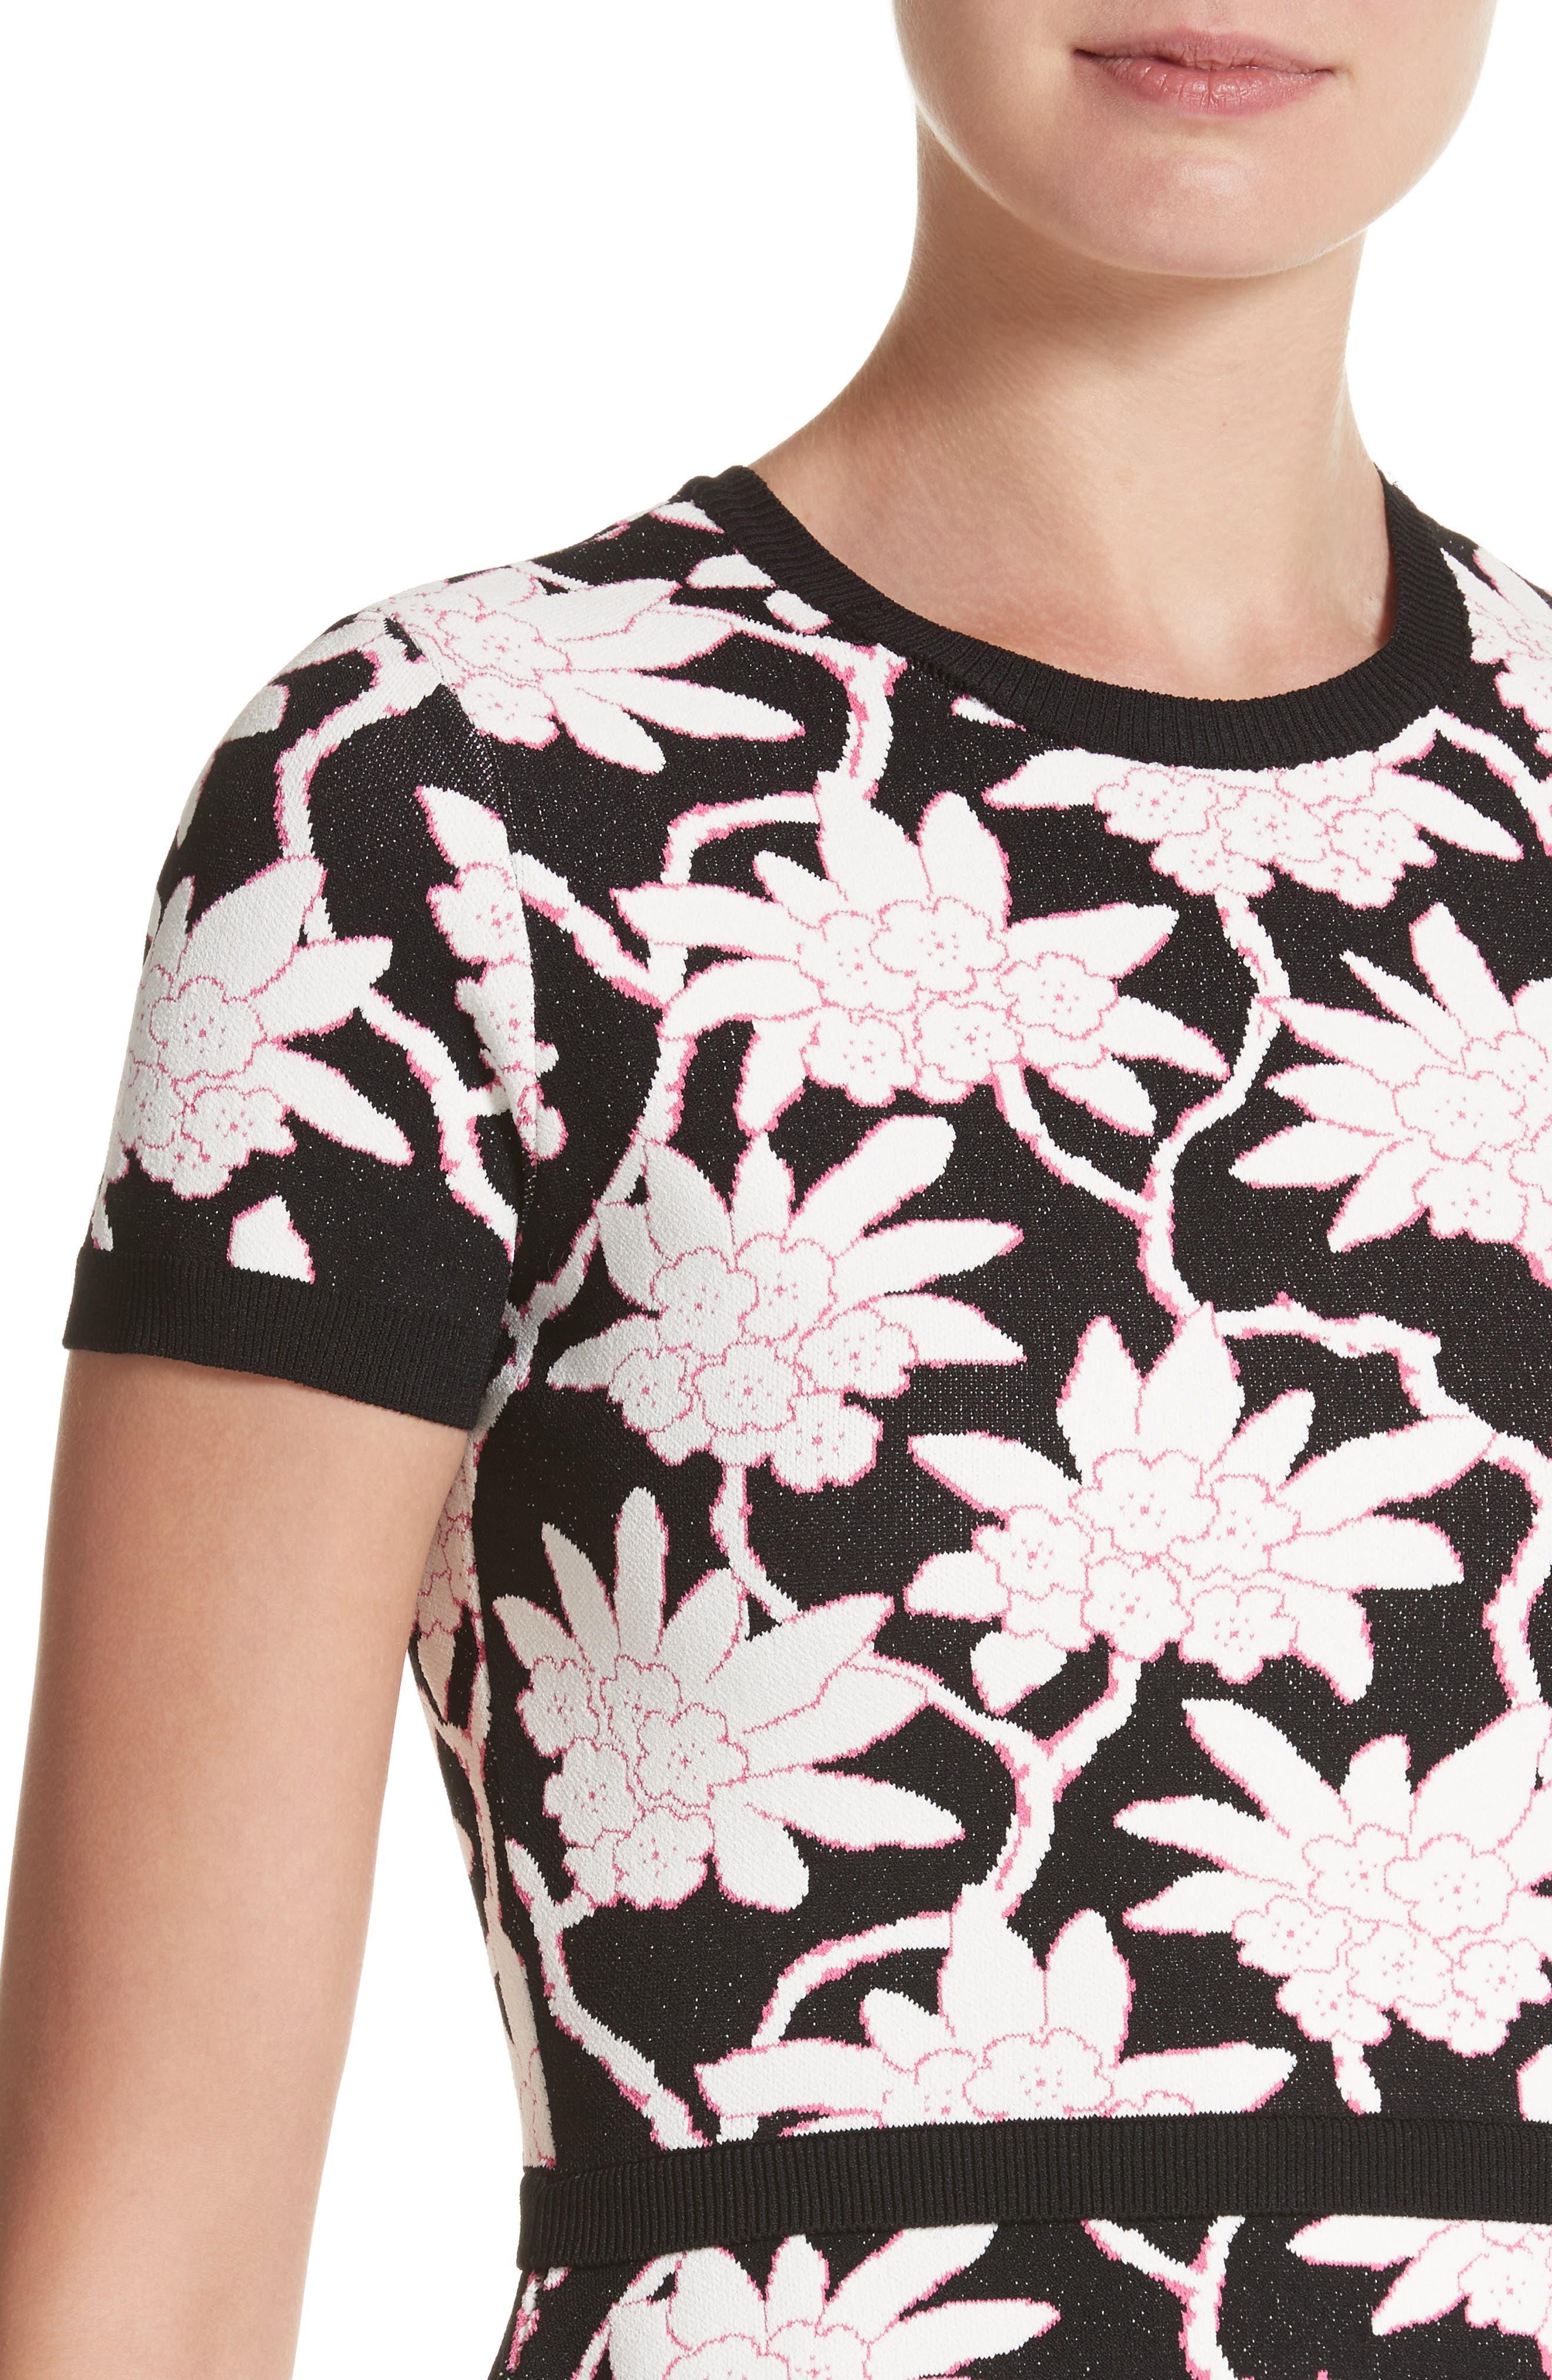 Rhododendron Jacquard Dress,                             Alternate thumbnail 4, color,                             001